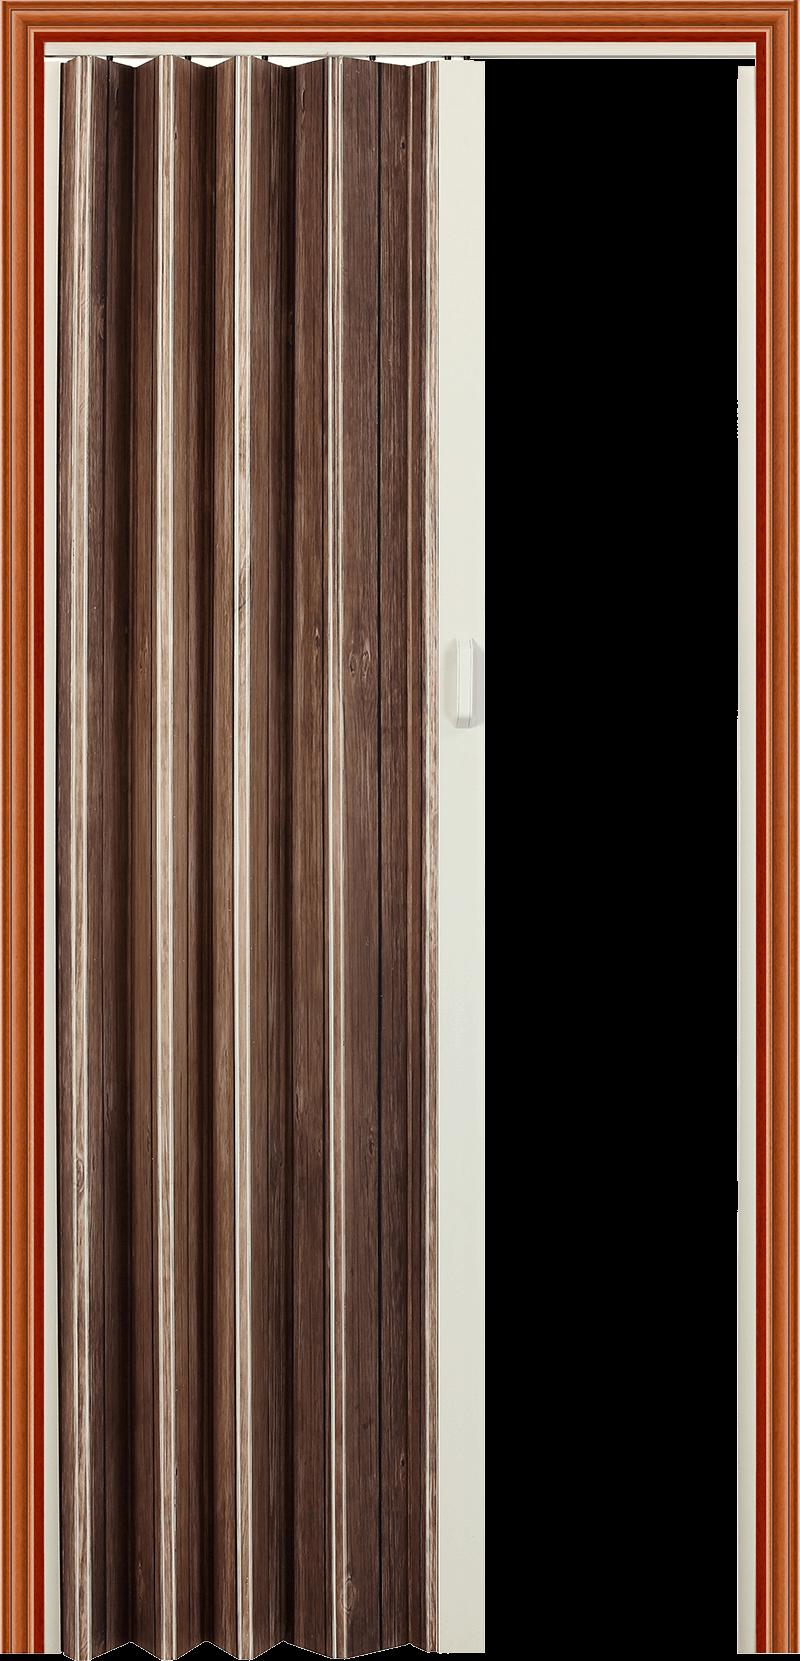 L06-001